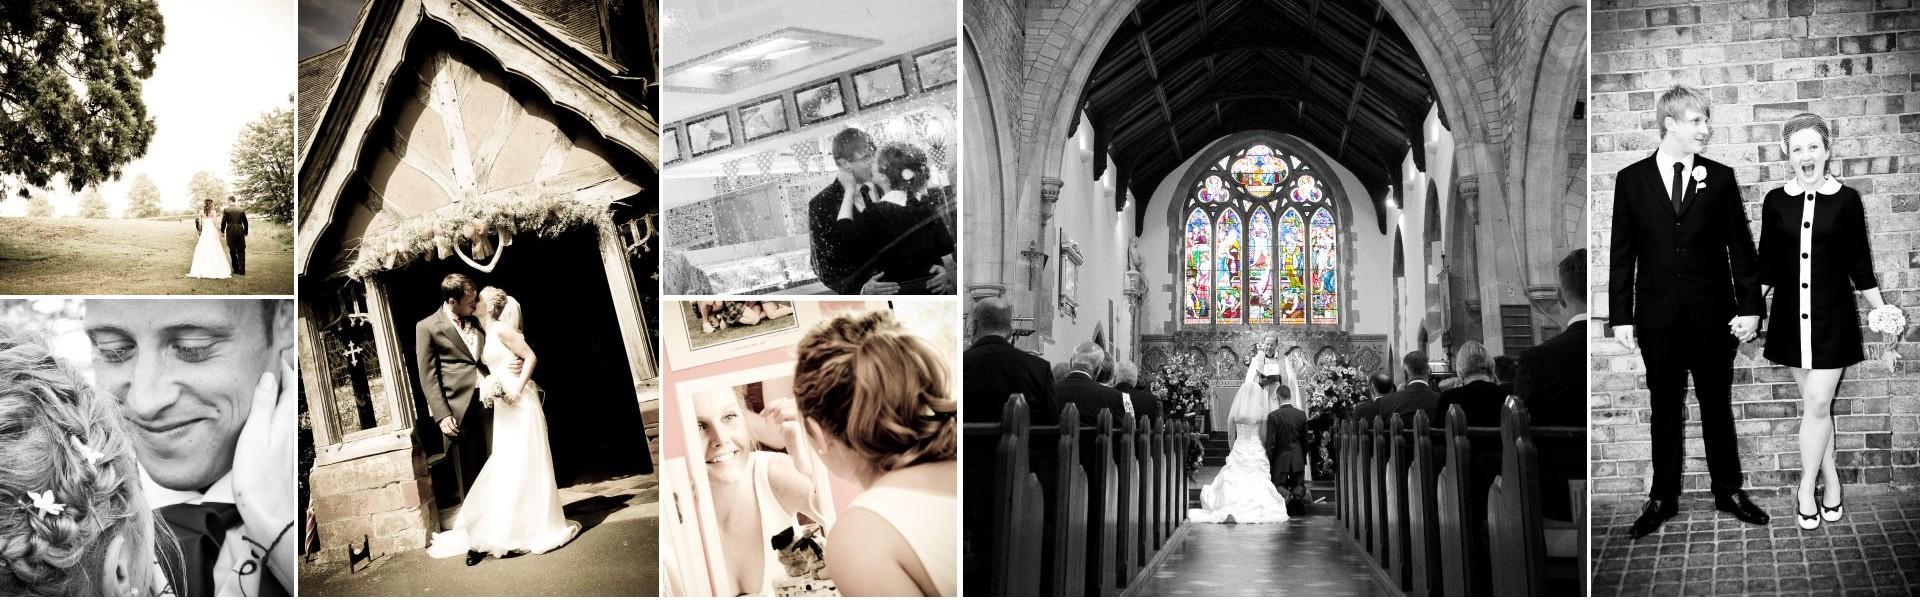 Wedding Photograph Bromsgrove,  Classical Wedding Photography